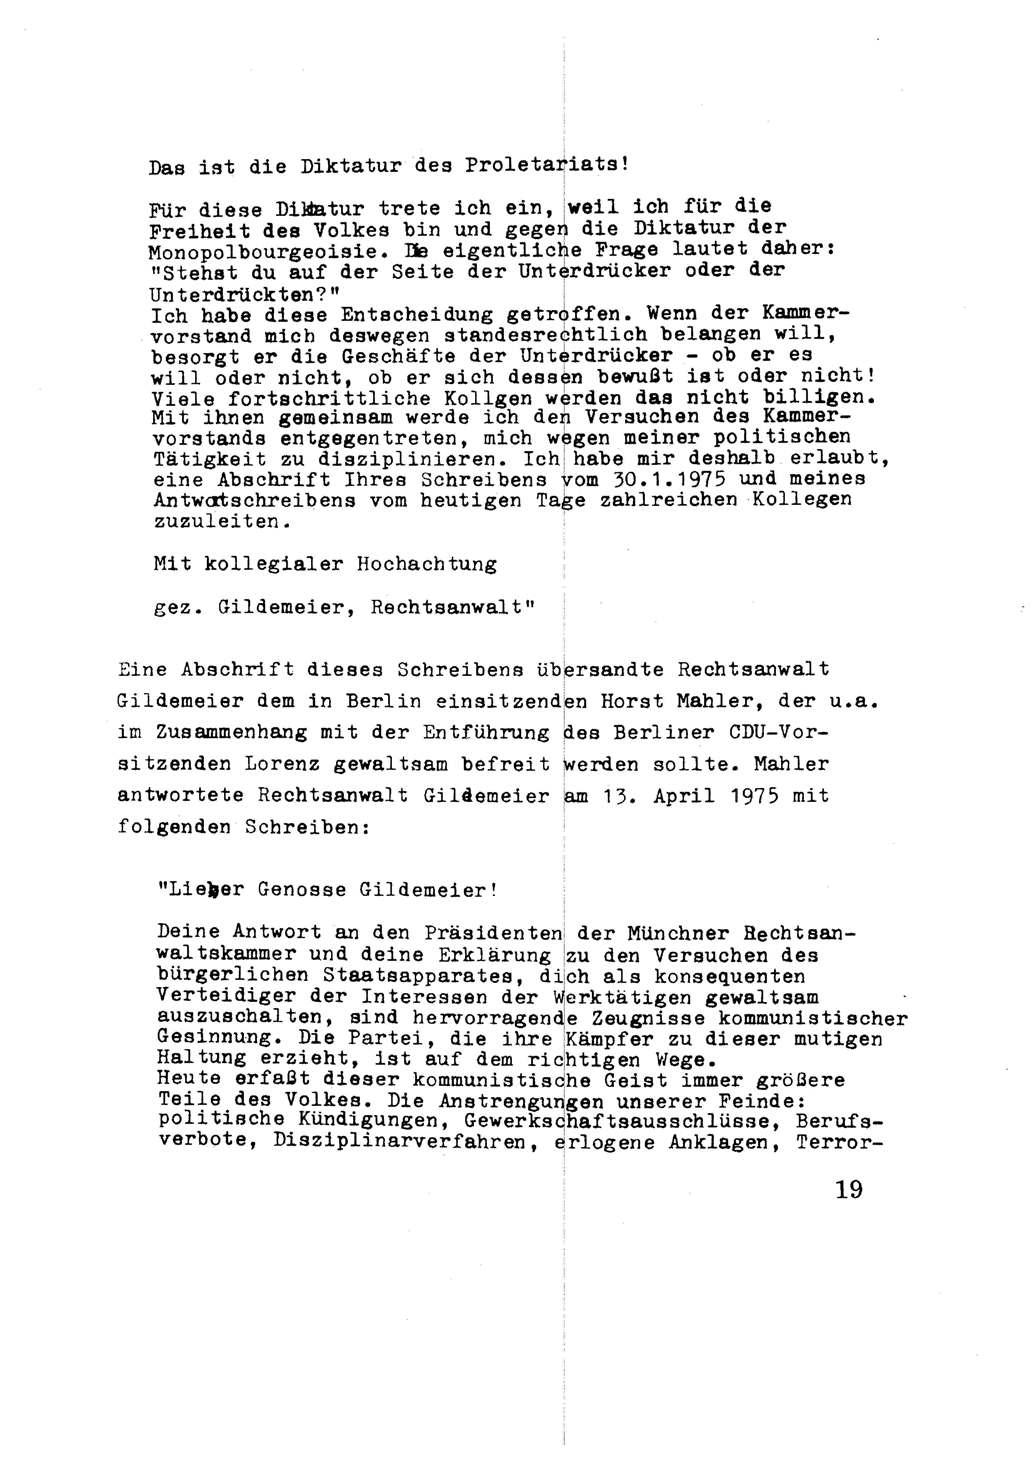 RHeV_Anschuldigung_RA_Gildemeier_Seite_19